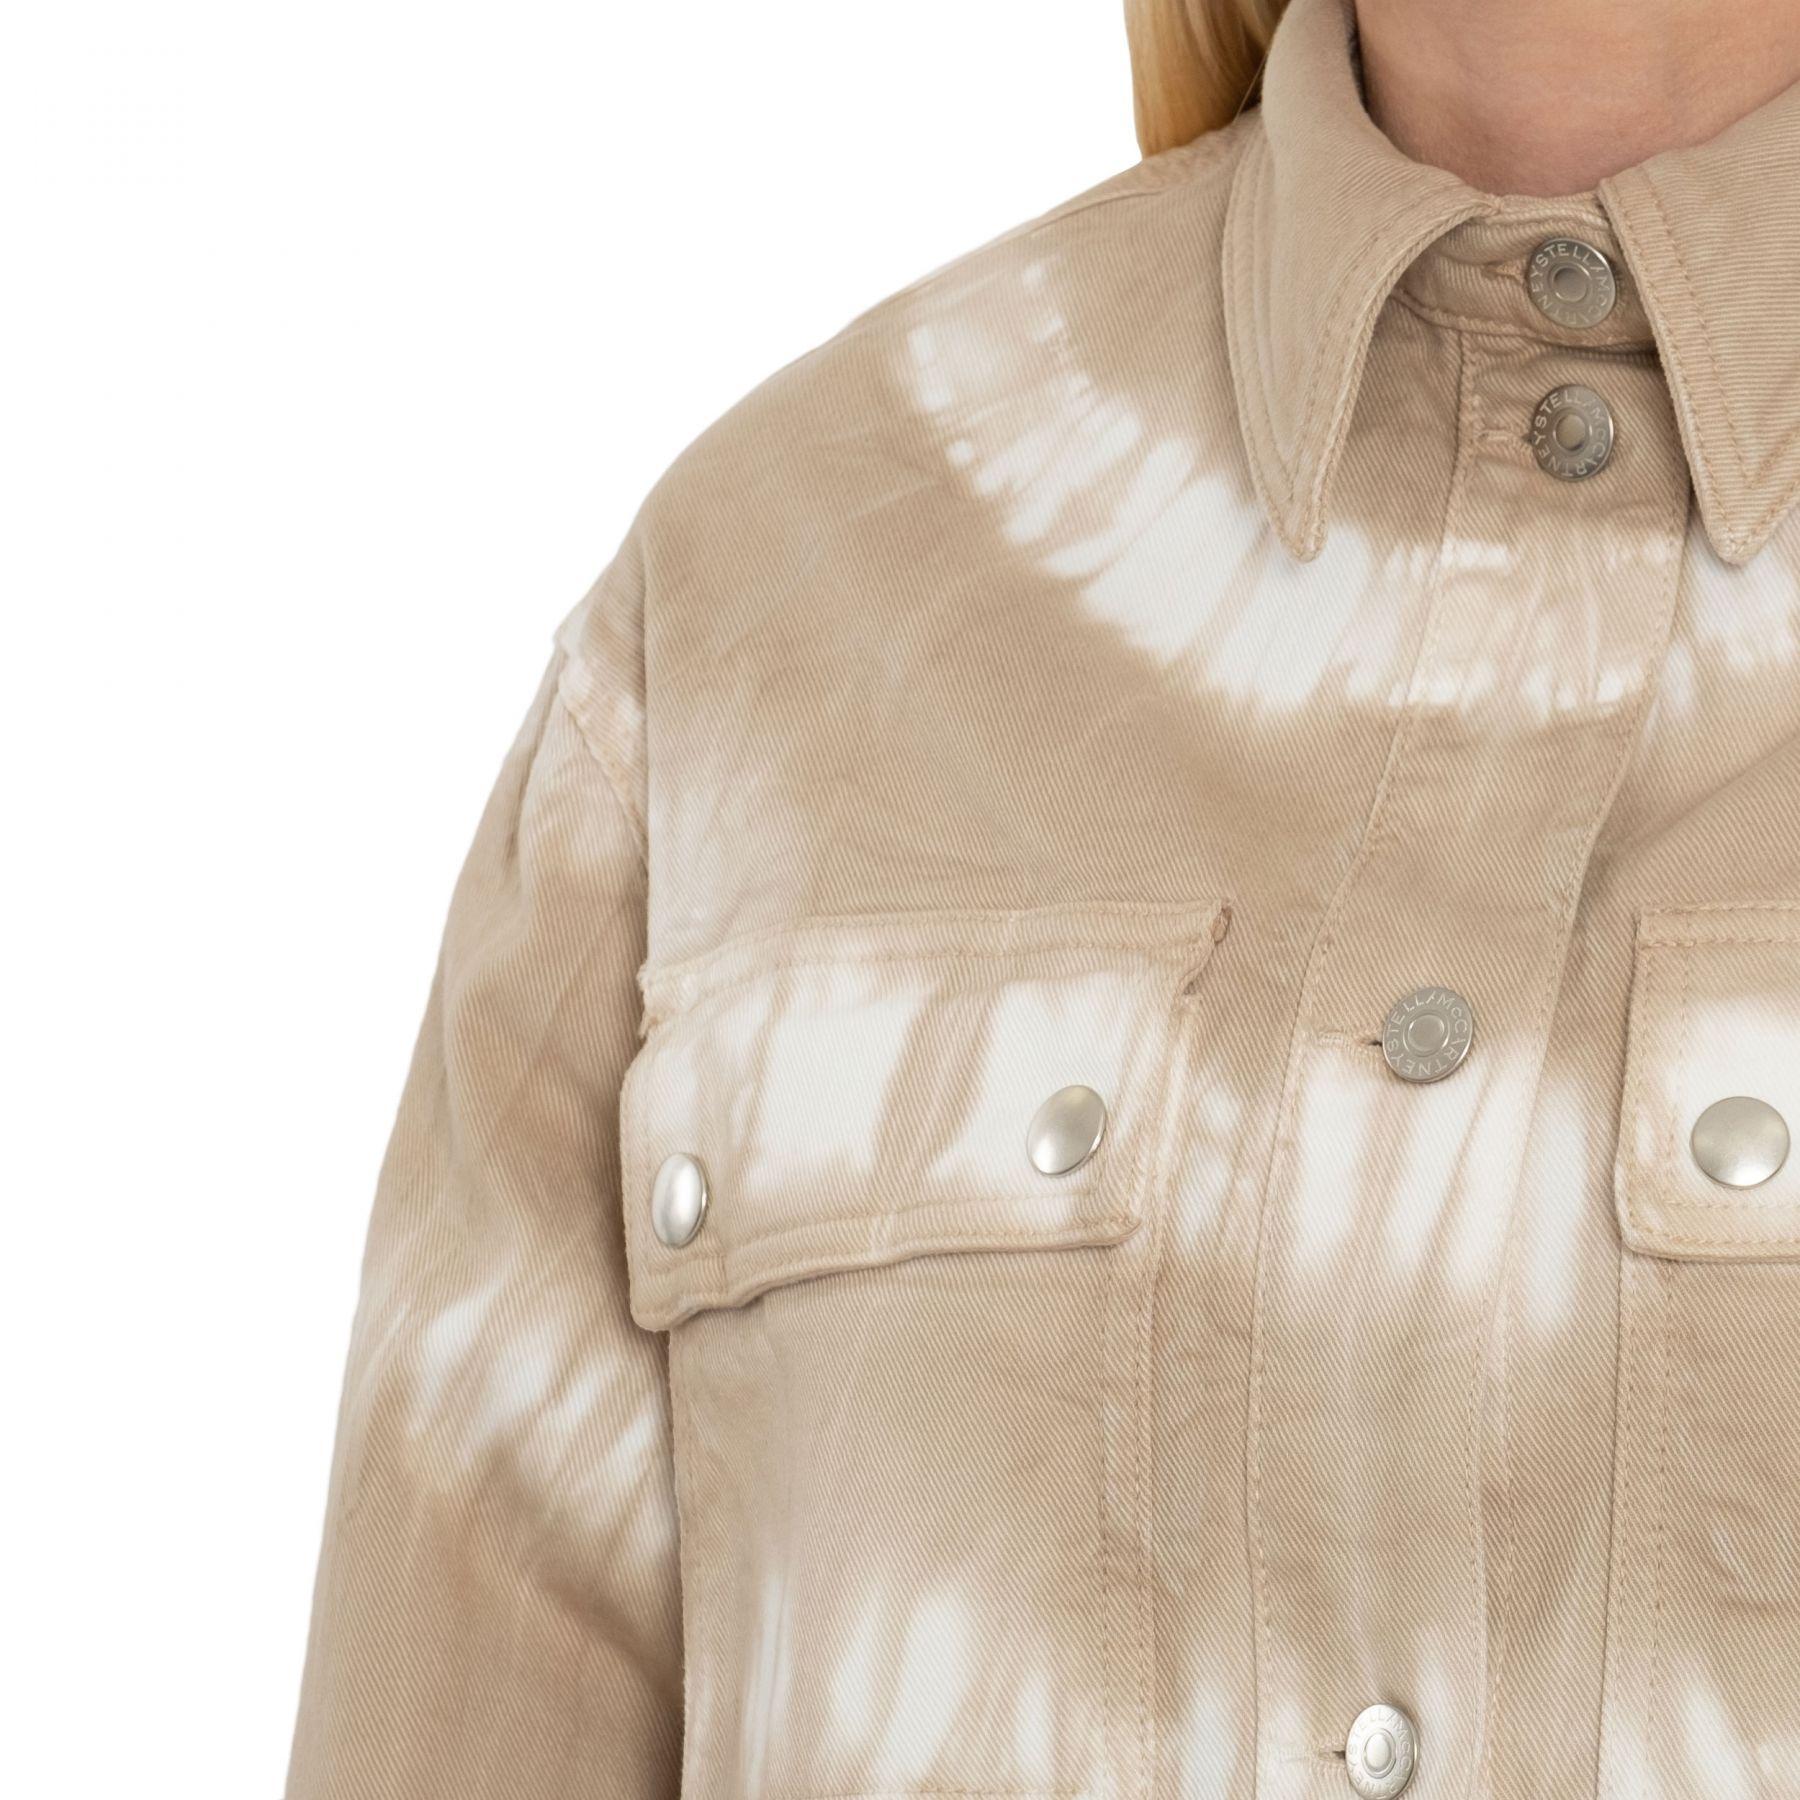 Рубашка с длинными рукавами Stella McCartney Tie-Dye бежевая